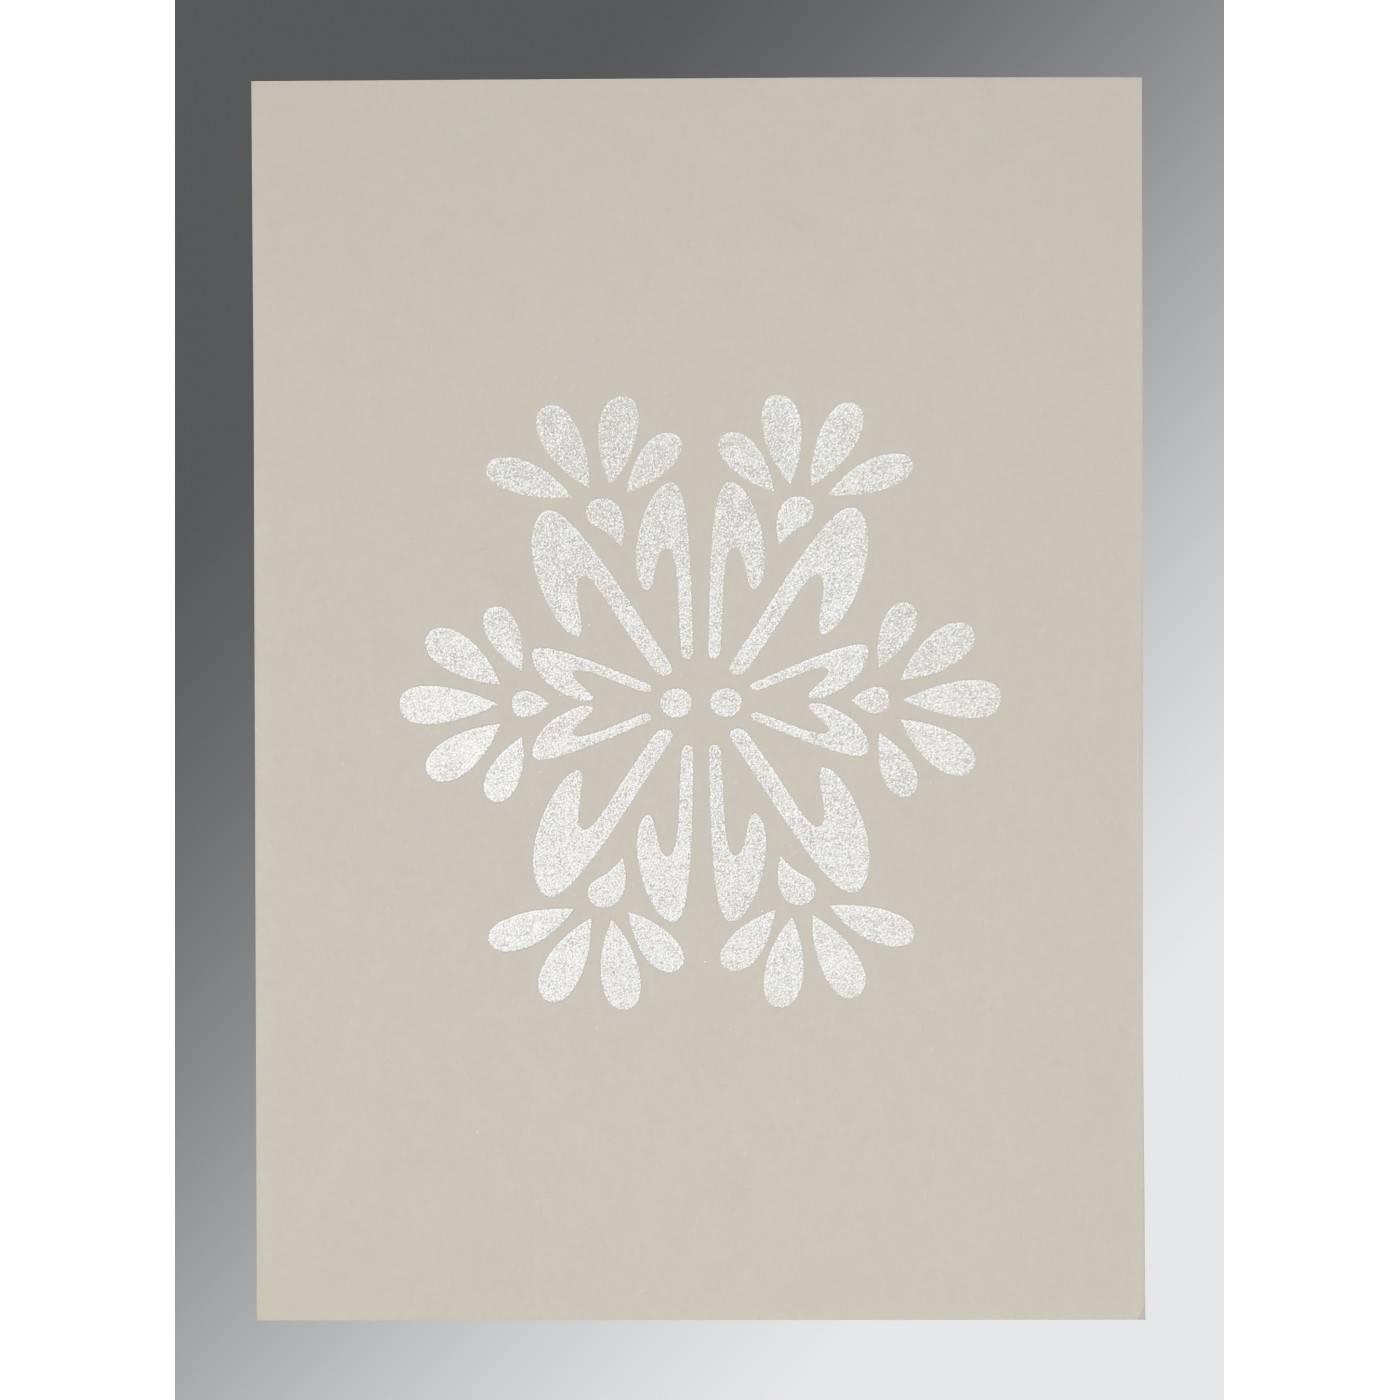 SAGE GREEN MATTE FLORAL THEMED - FOIL STAMPED WEDDING INVITATION : CG-8237I - IndianWeddingCards